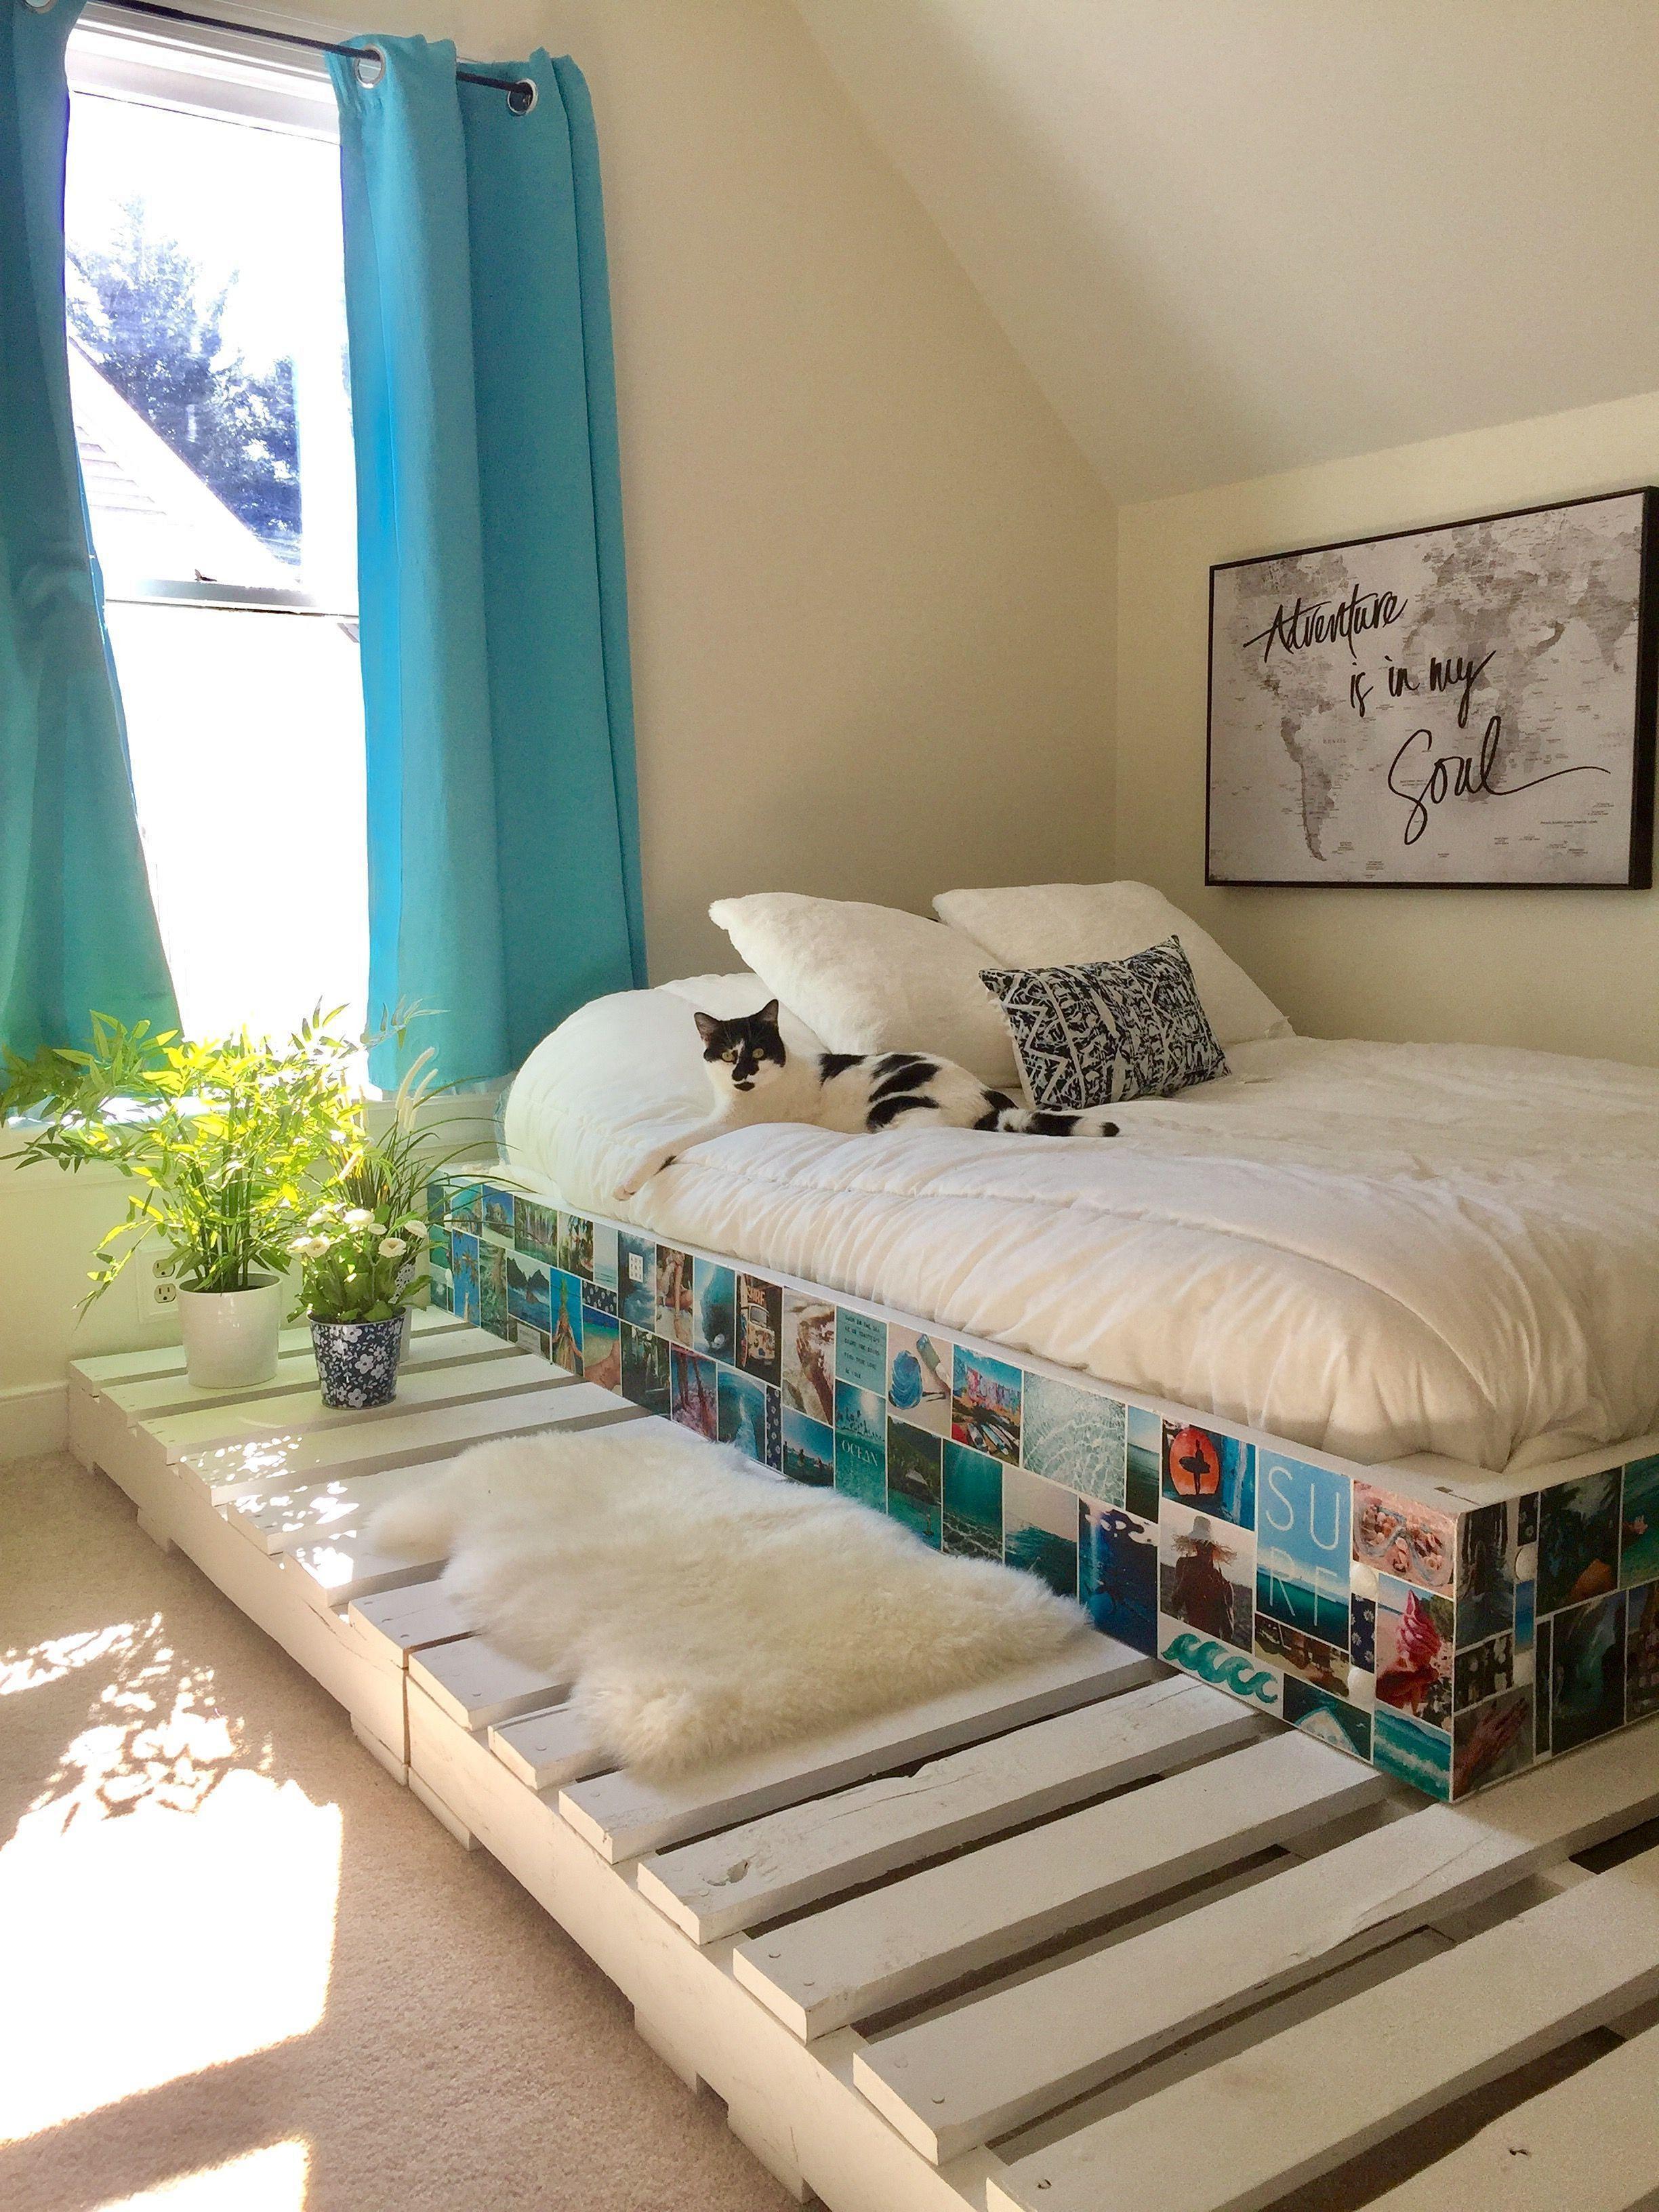 Inspiring 15+ Incredible DIY Bed Frame Ideas For a More